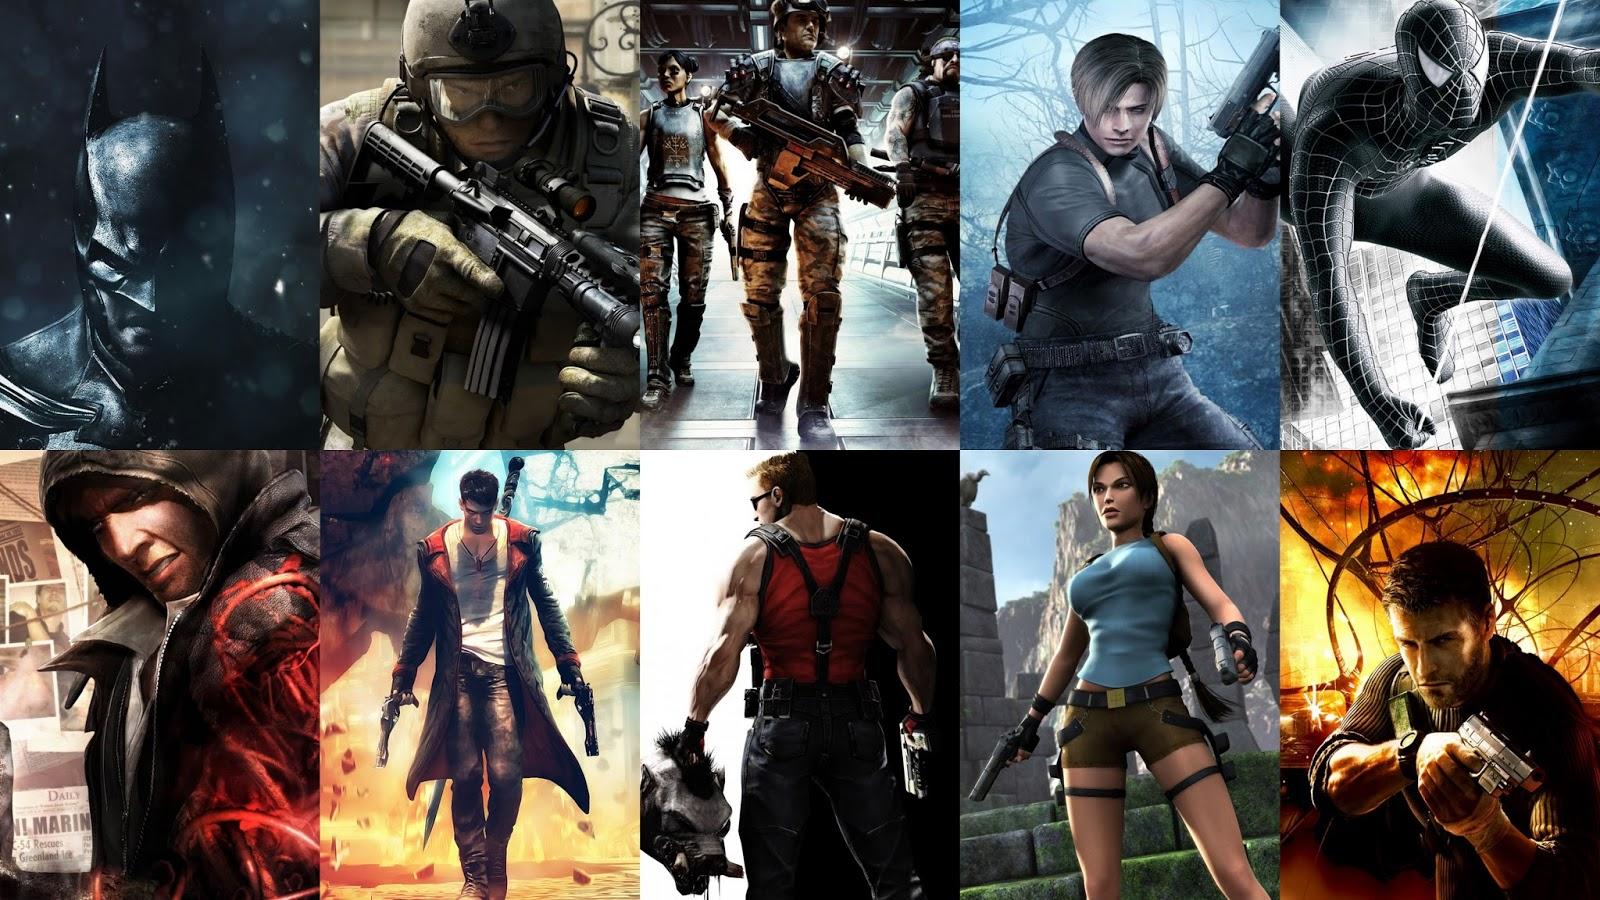 Desktop Background: Games Wallpapers Hd Pack Download